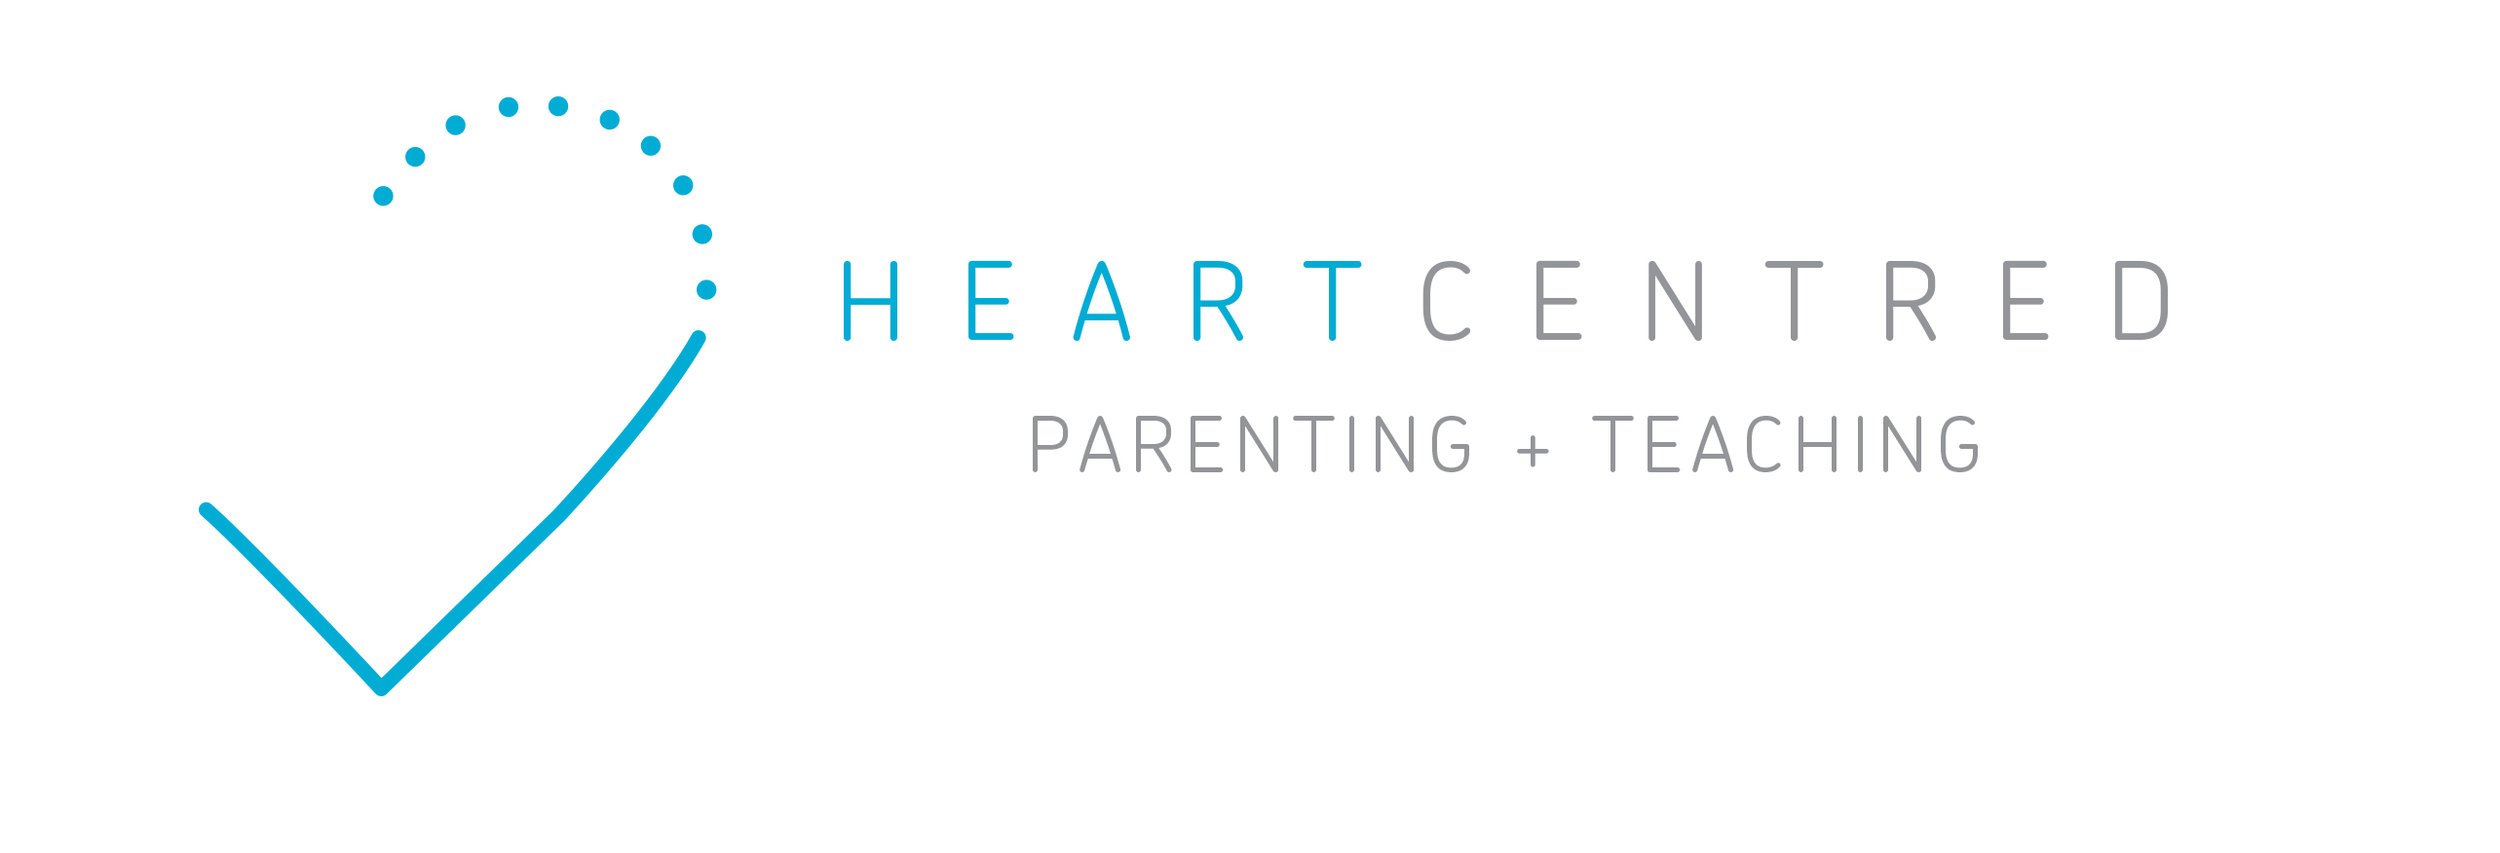 HC_P+T logo.jpg